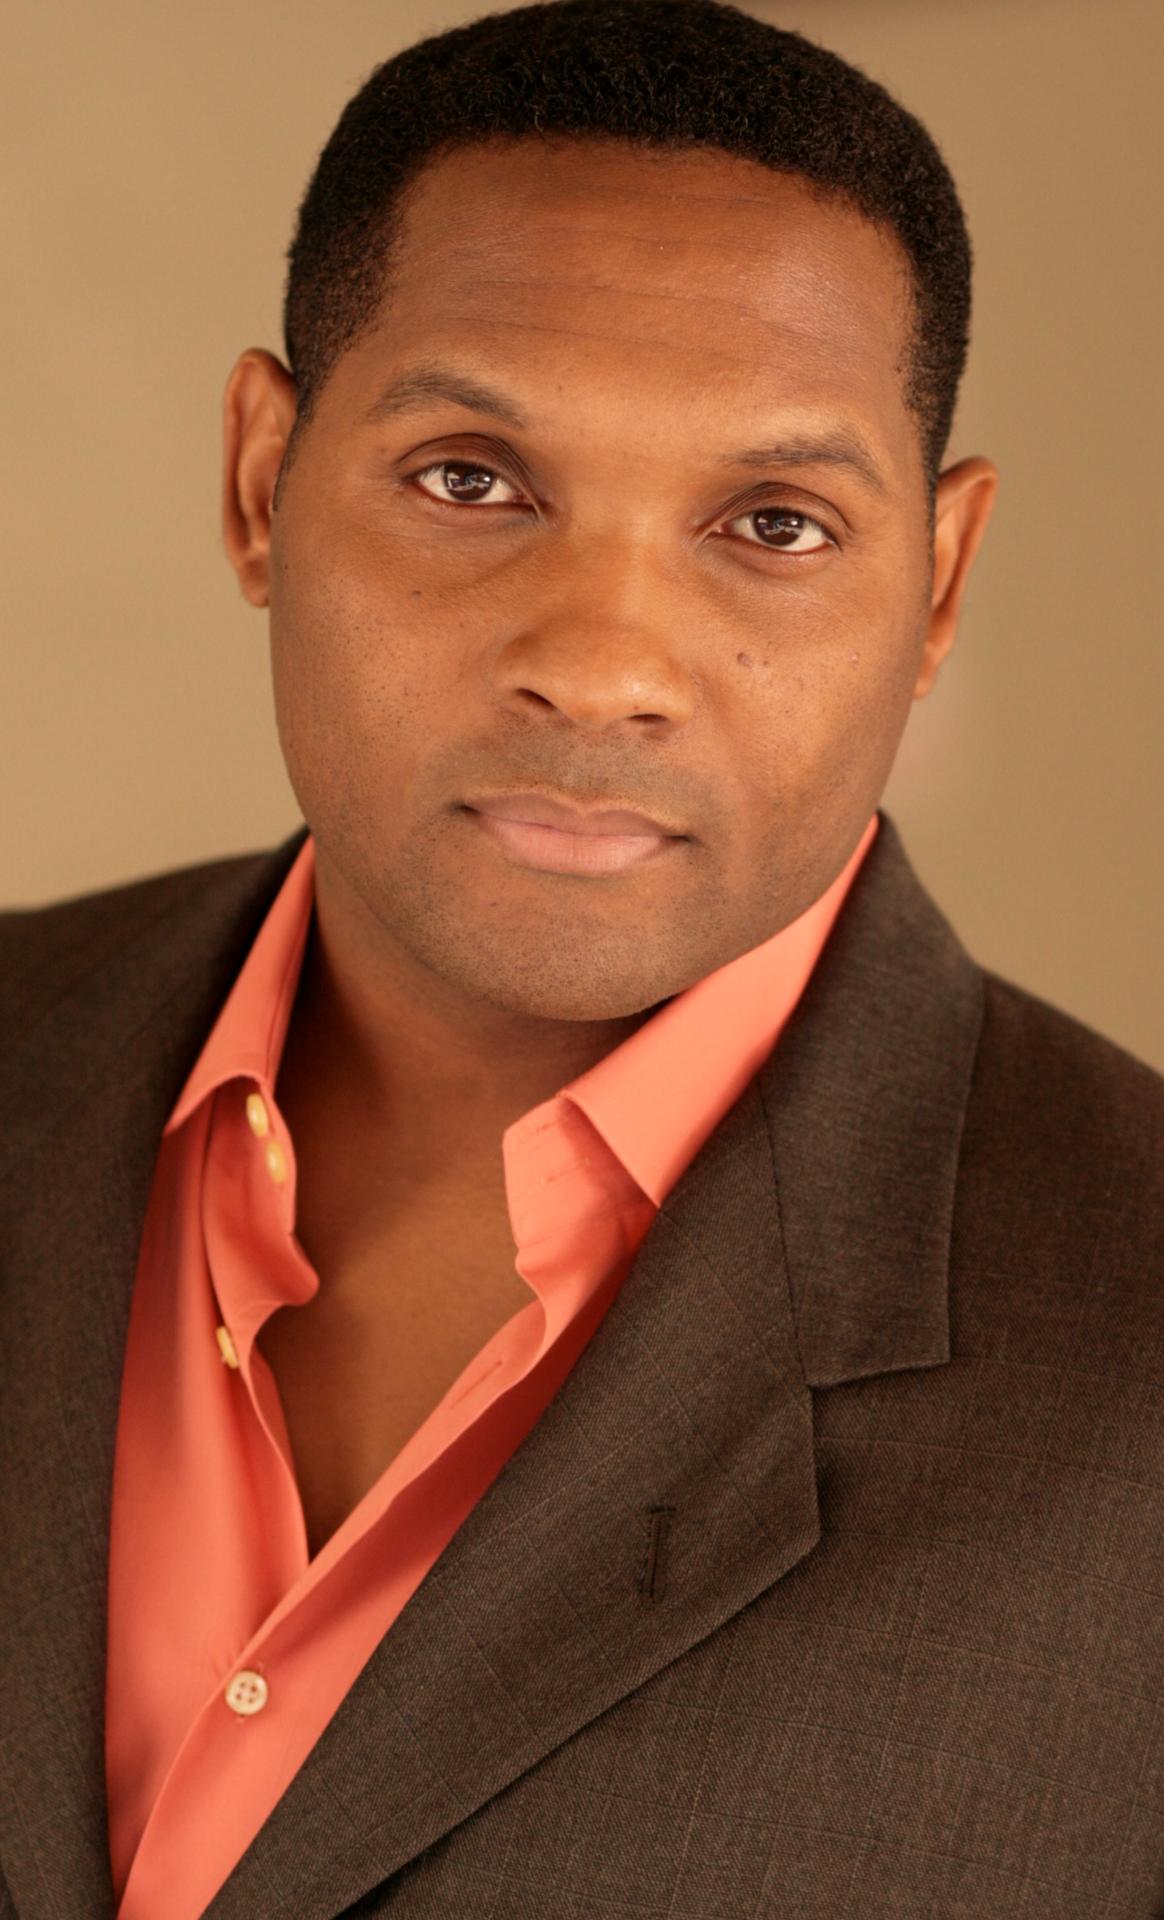 Actor Tim Starks